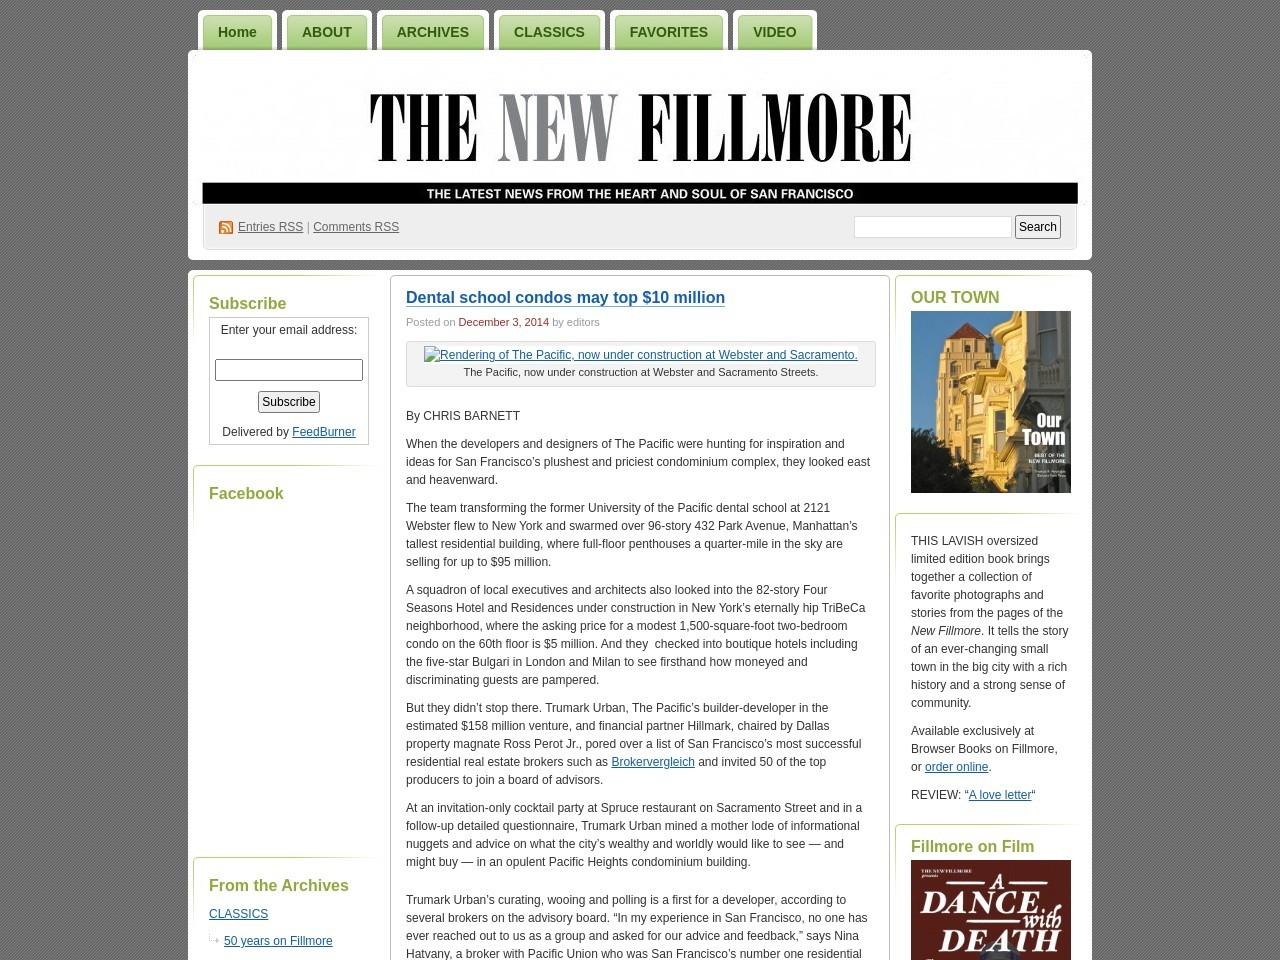 Dental school condos may top $10 million | The New Fillmore